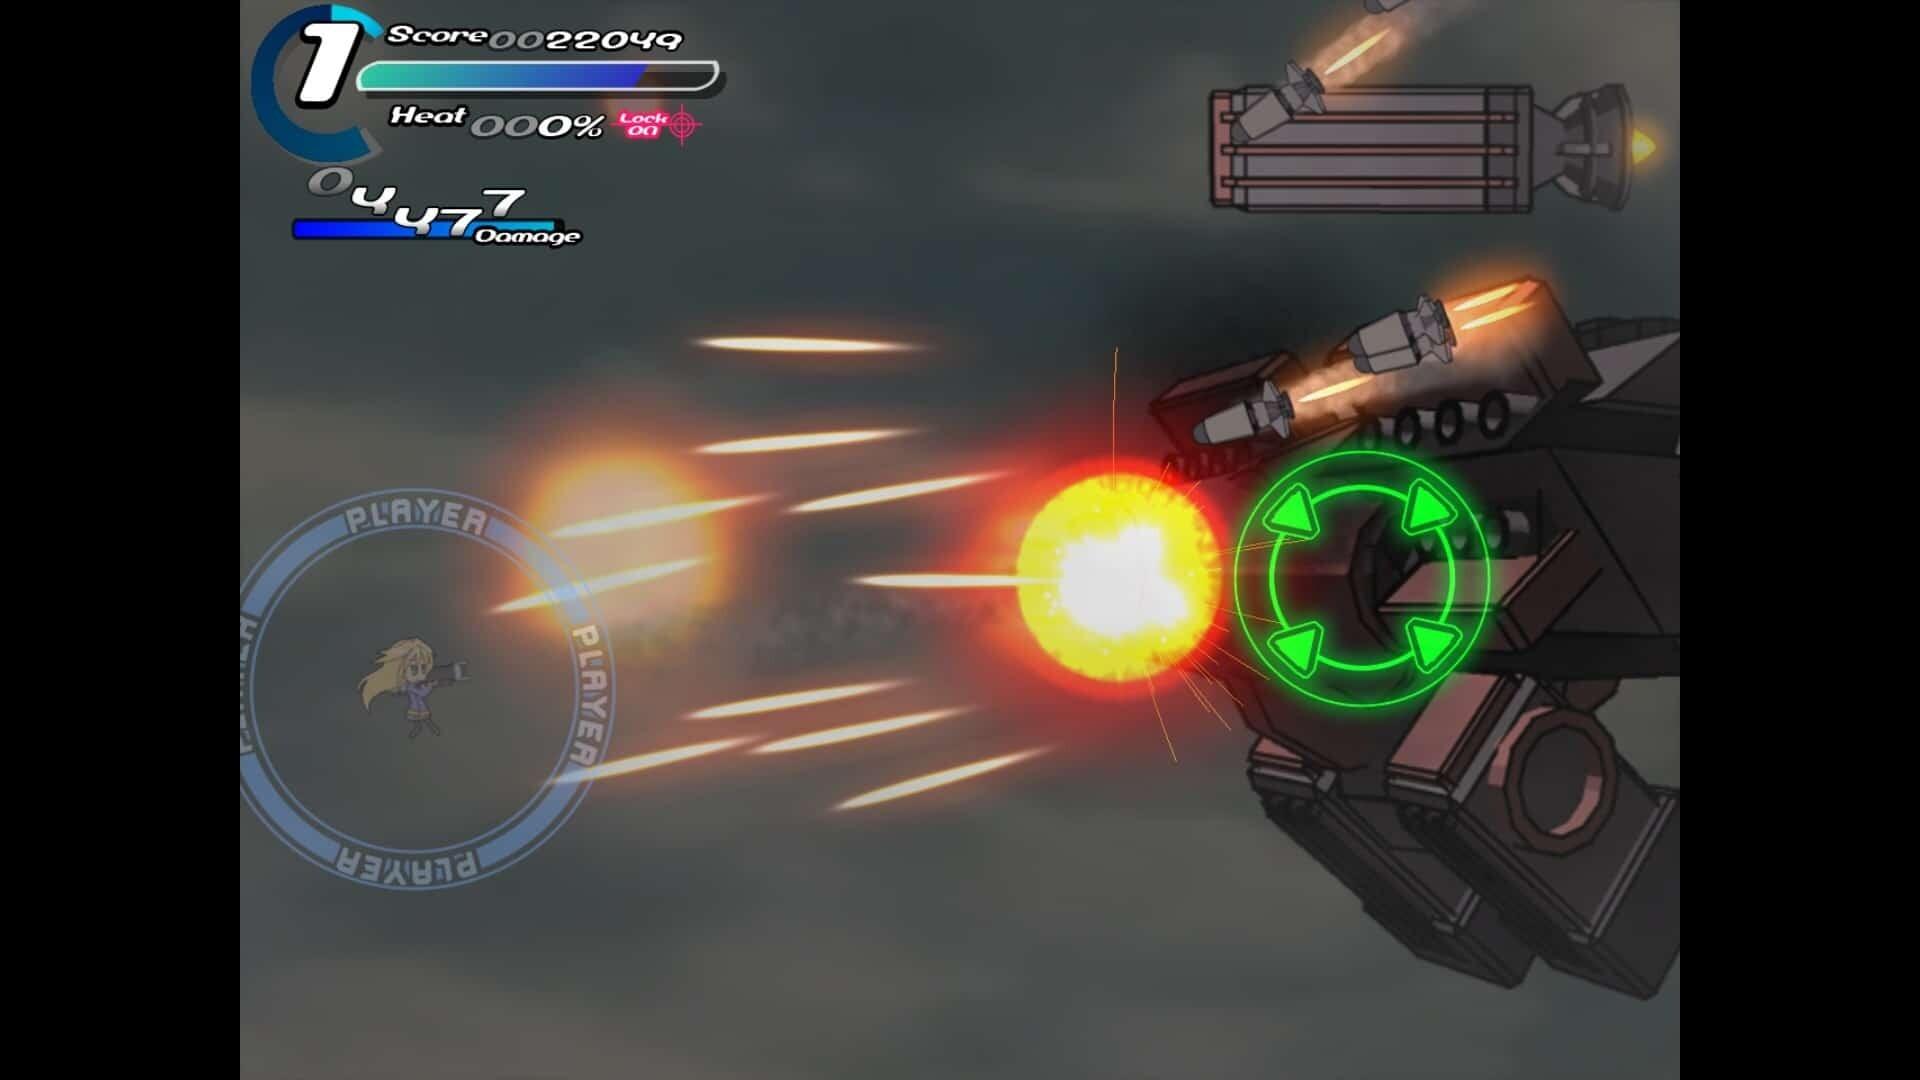 Sora game screenshot, energy weapons